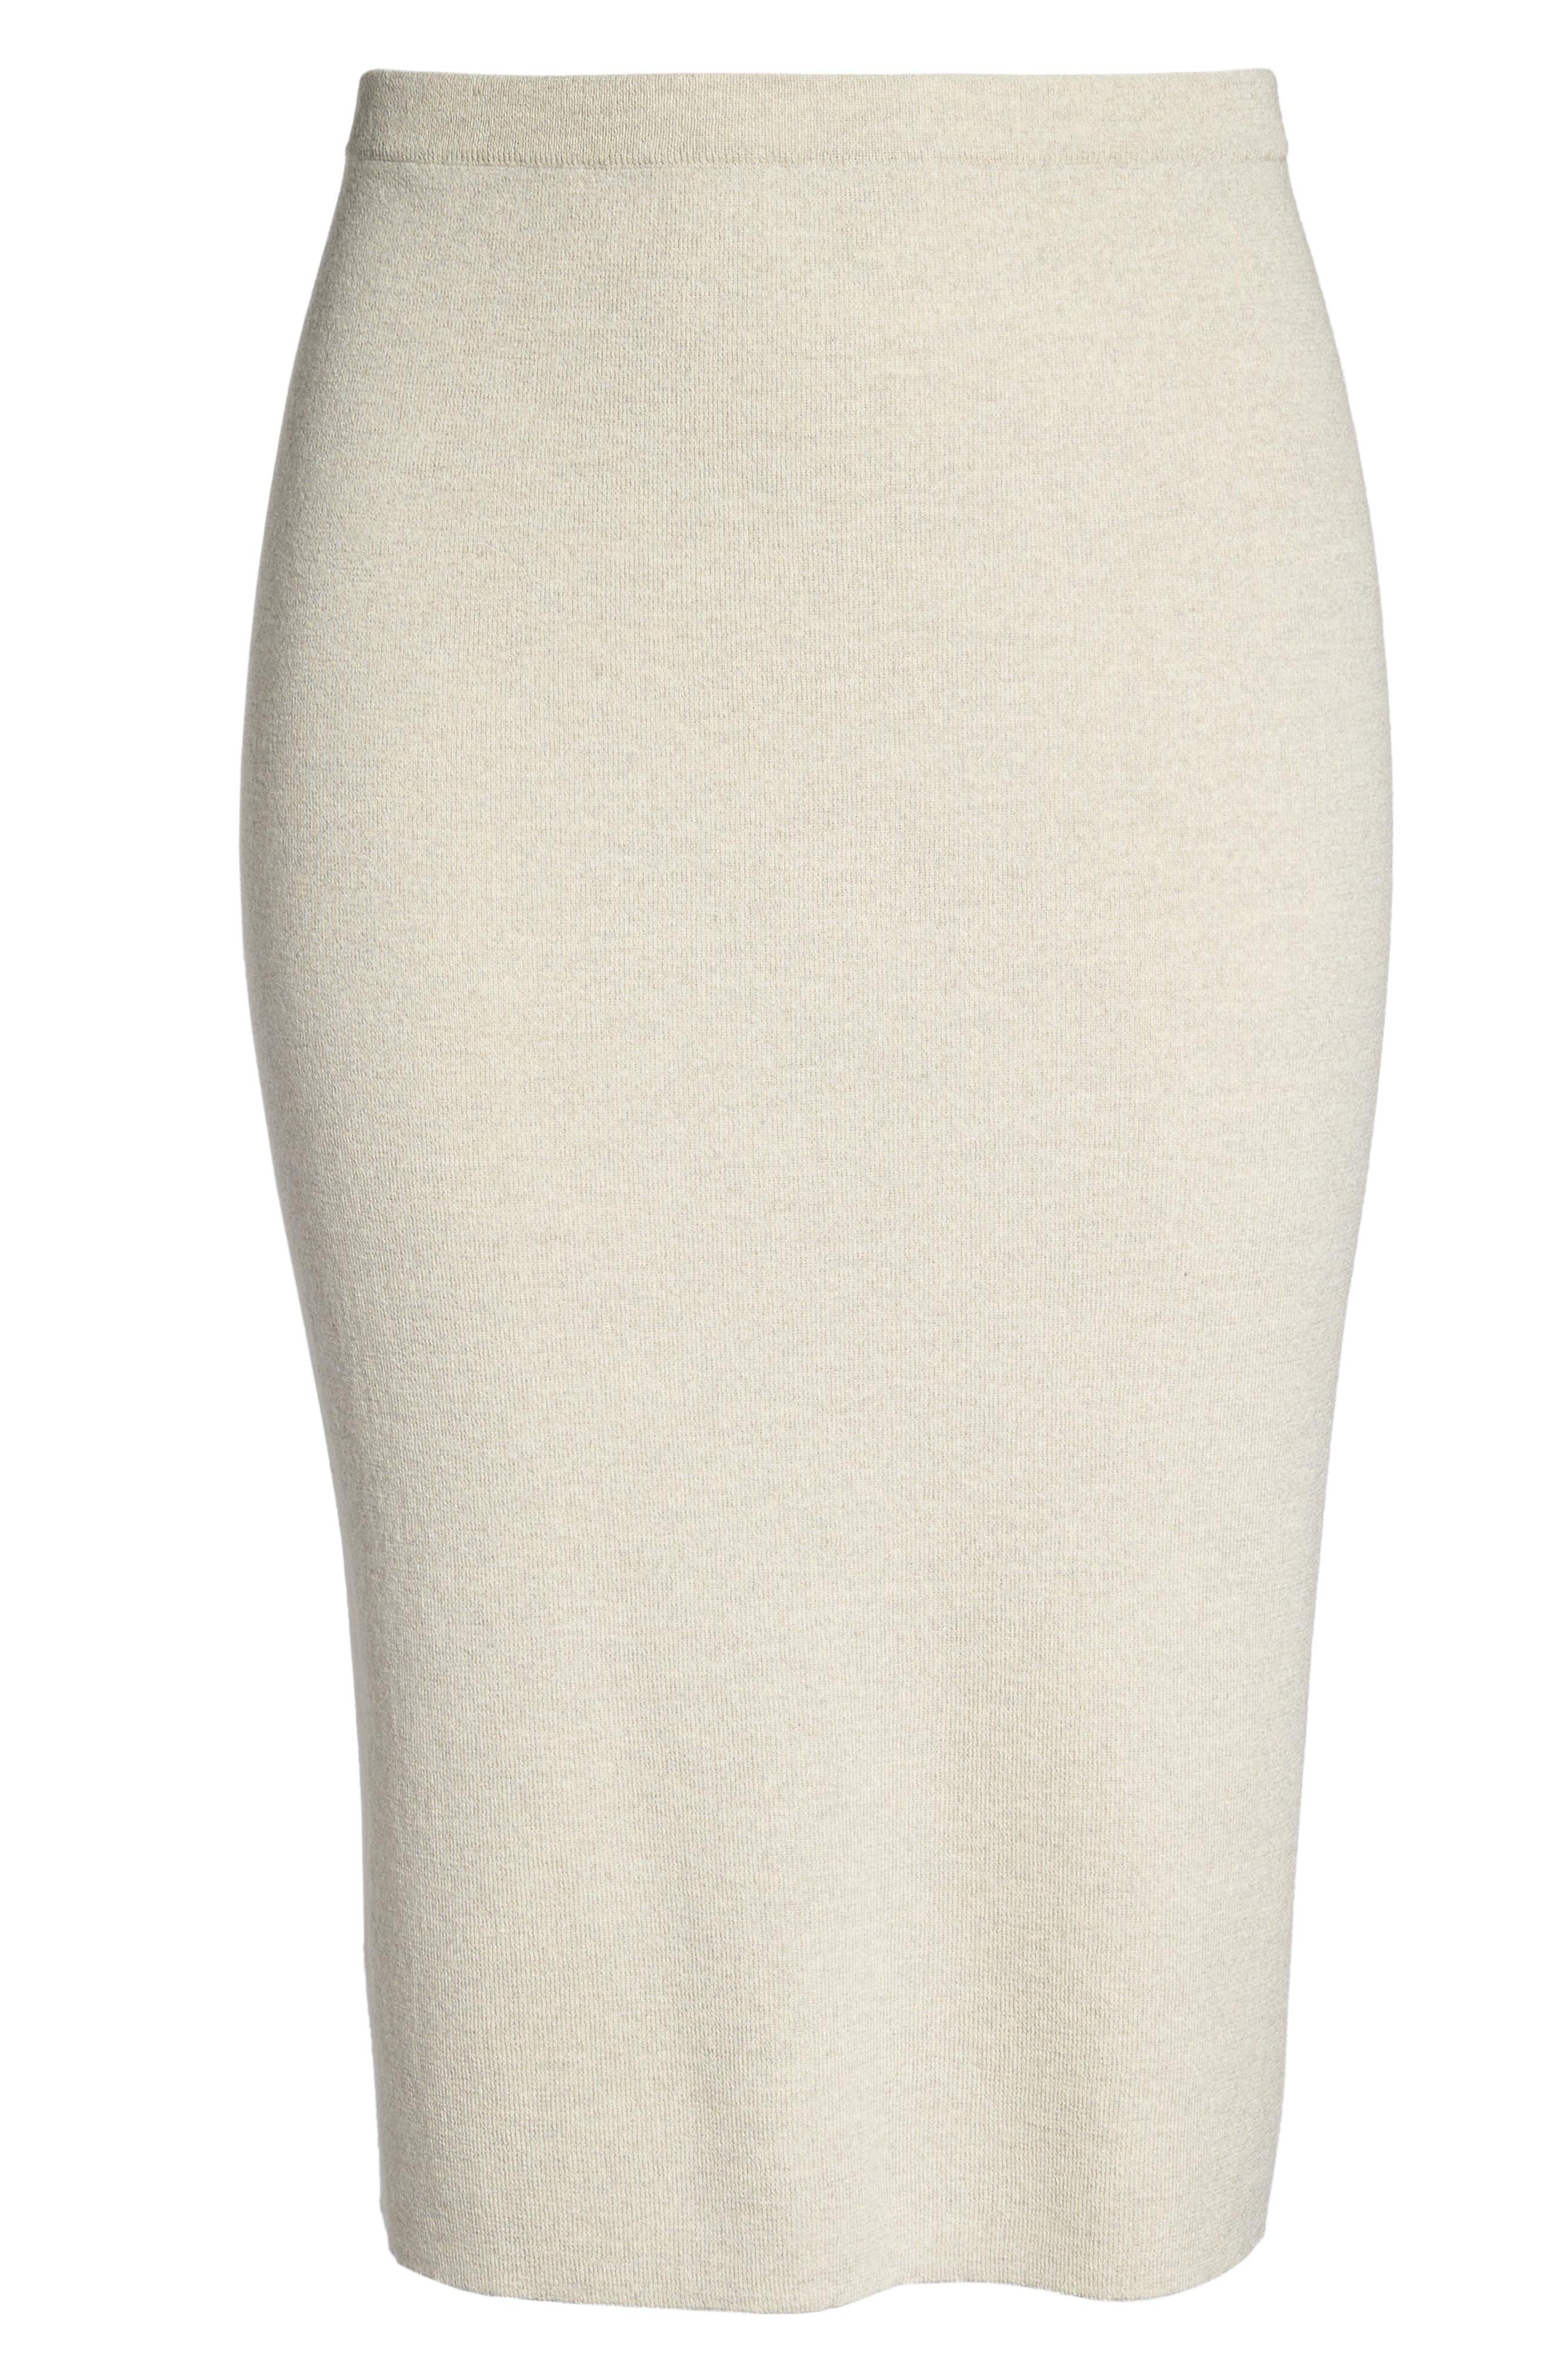 Wool Knit Pencil Skirt,                             Alternate thumbnail 6, color,                             Sea Salt